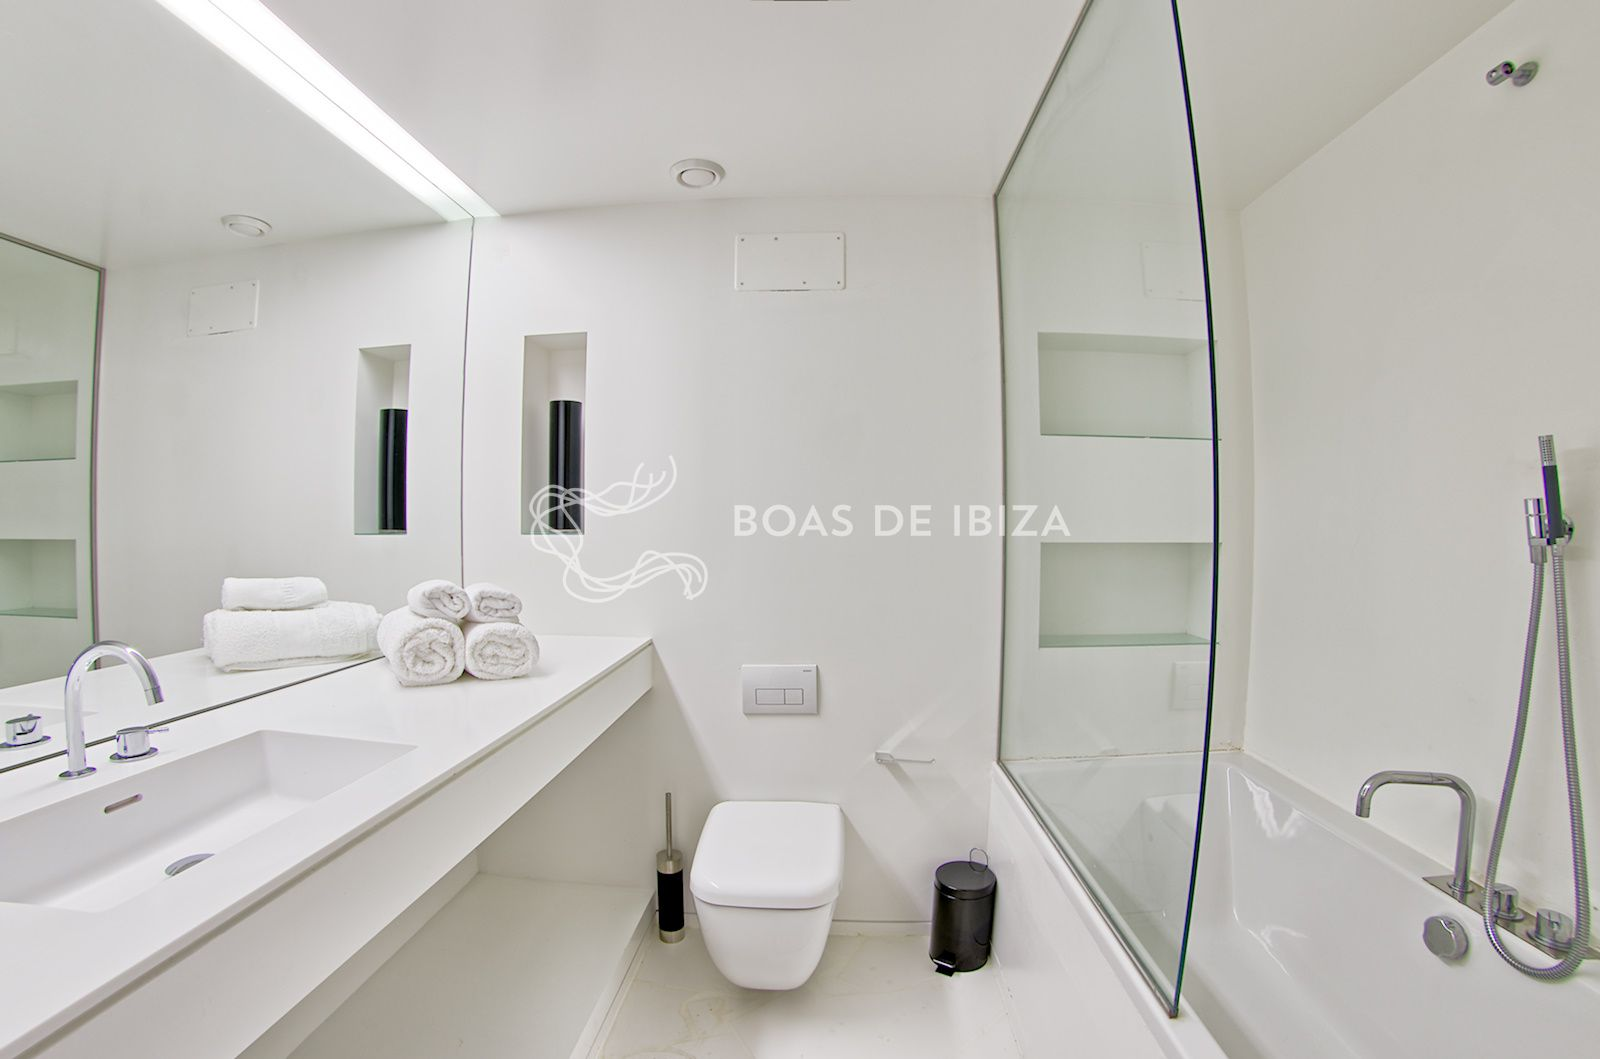 Boas_JPG-1600x1059_16